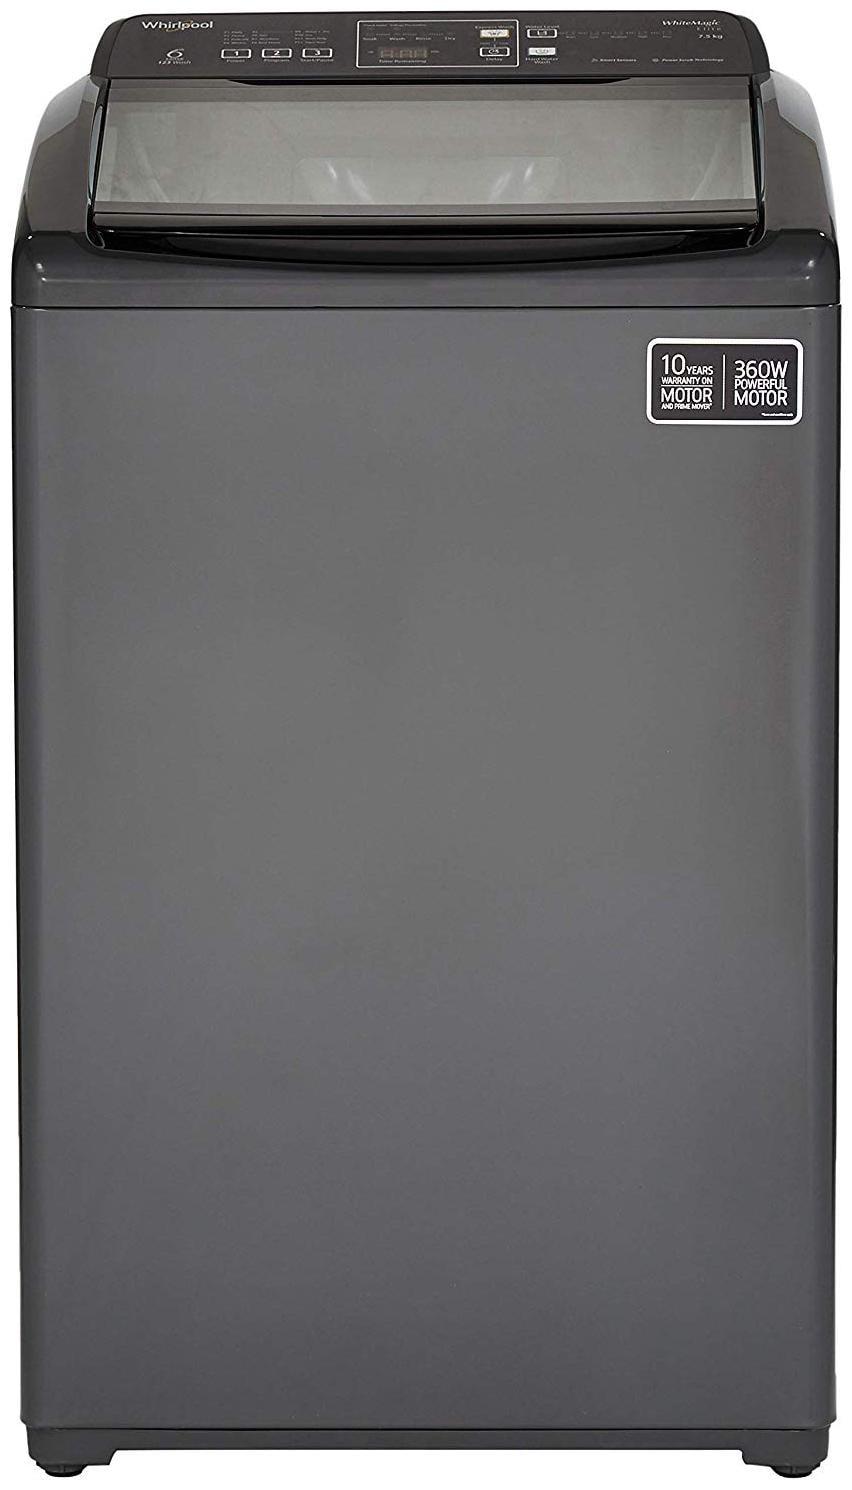 Whirlpool 7.5 Kg Fully automatic top load Washing machine   WHITEMAGIC ELITE 7.5 10YMW , Grey